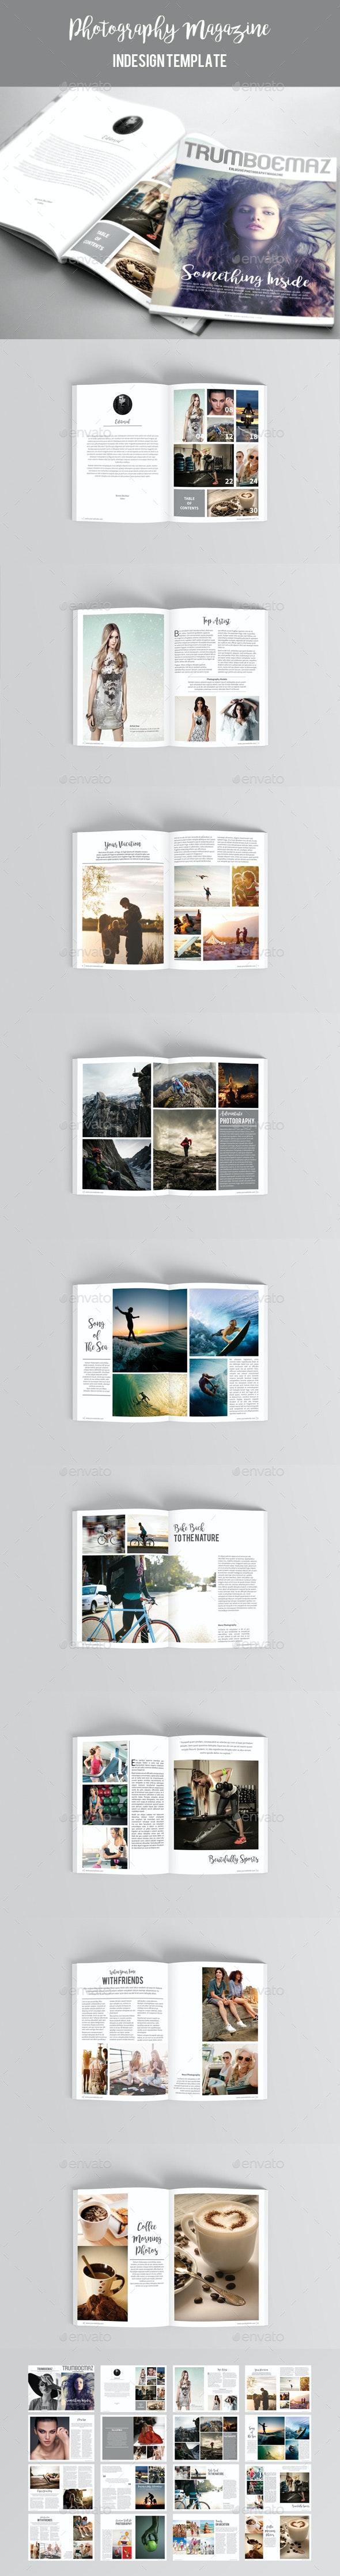 Photography Magazine Template - Magazines Print Templates